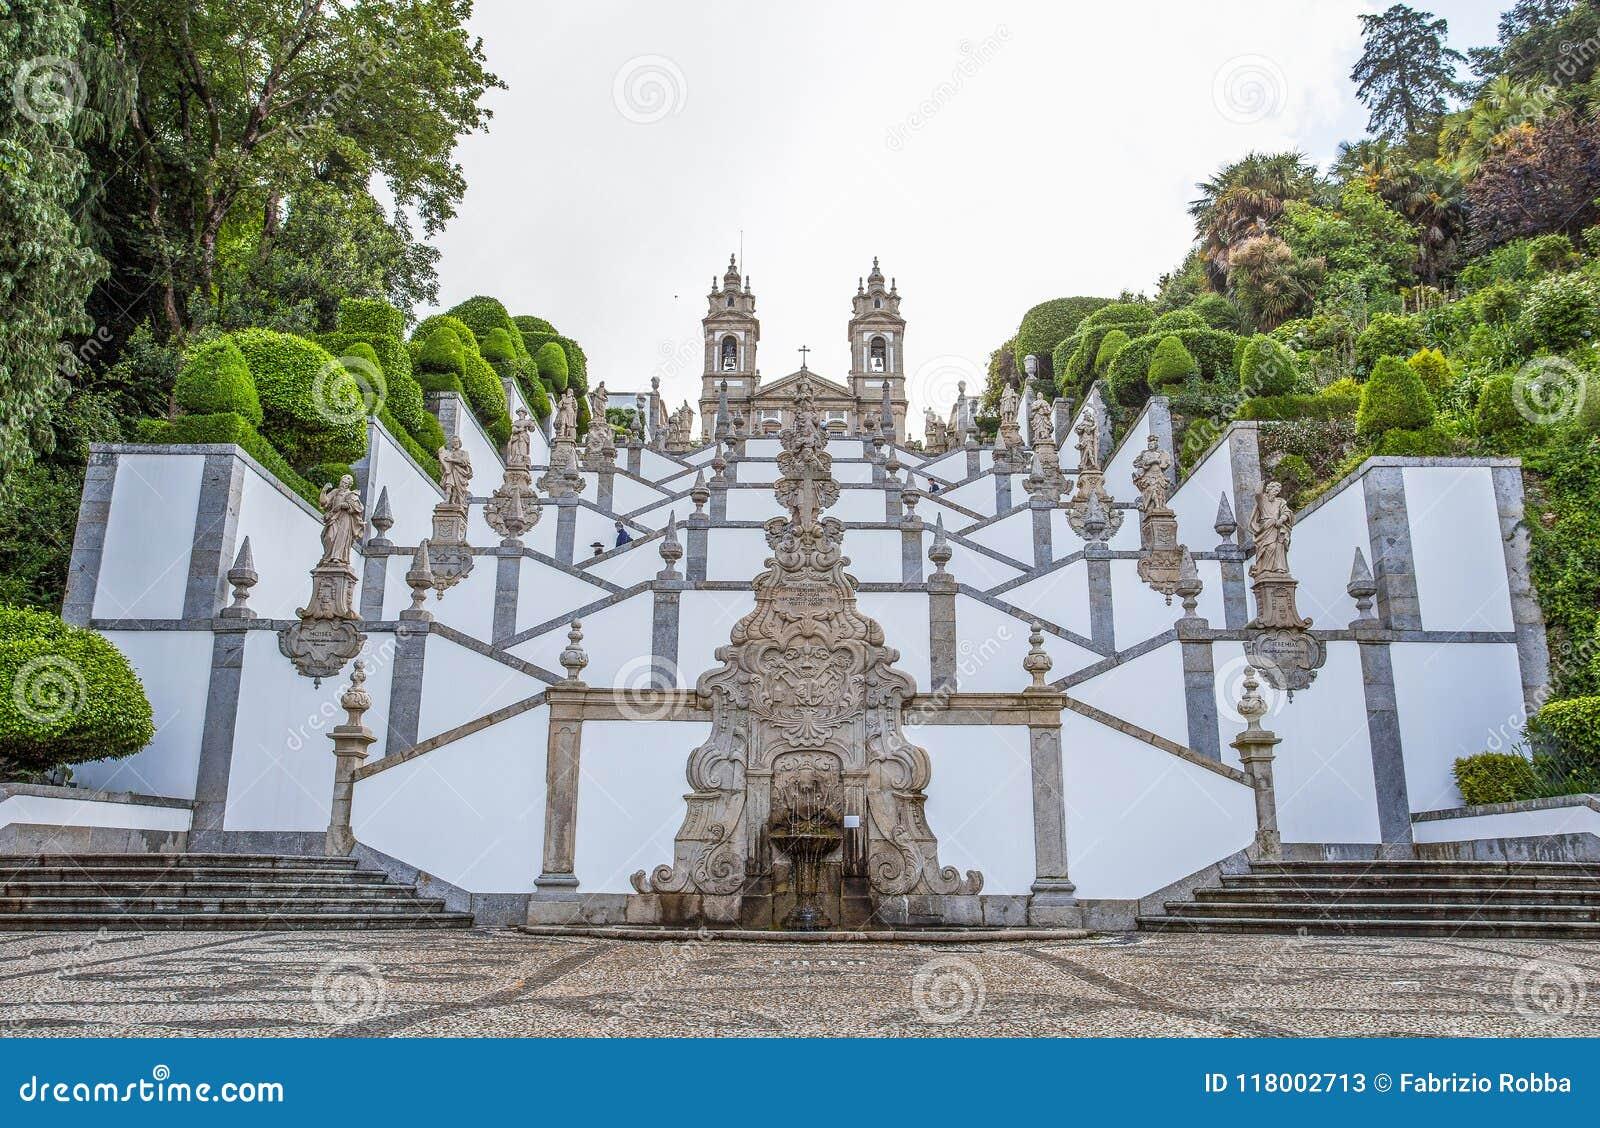 The neoclassical Basilica of Bom Jesus do Monte / Church/ religion/ faithfuls/ Braga/ Portugal